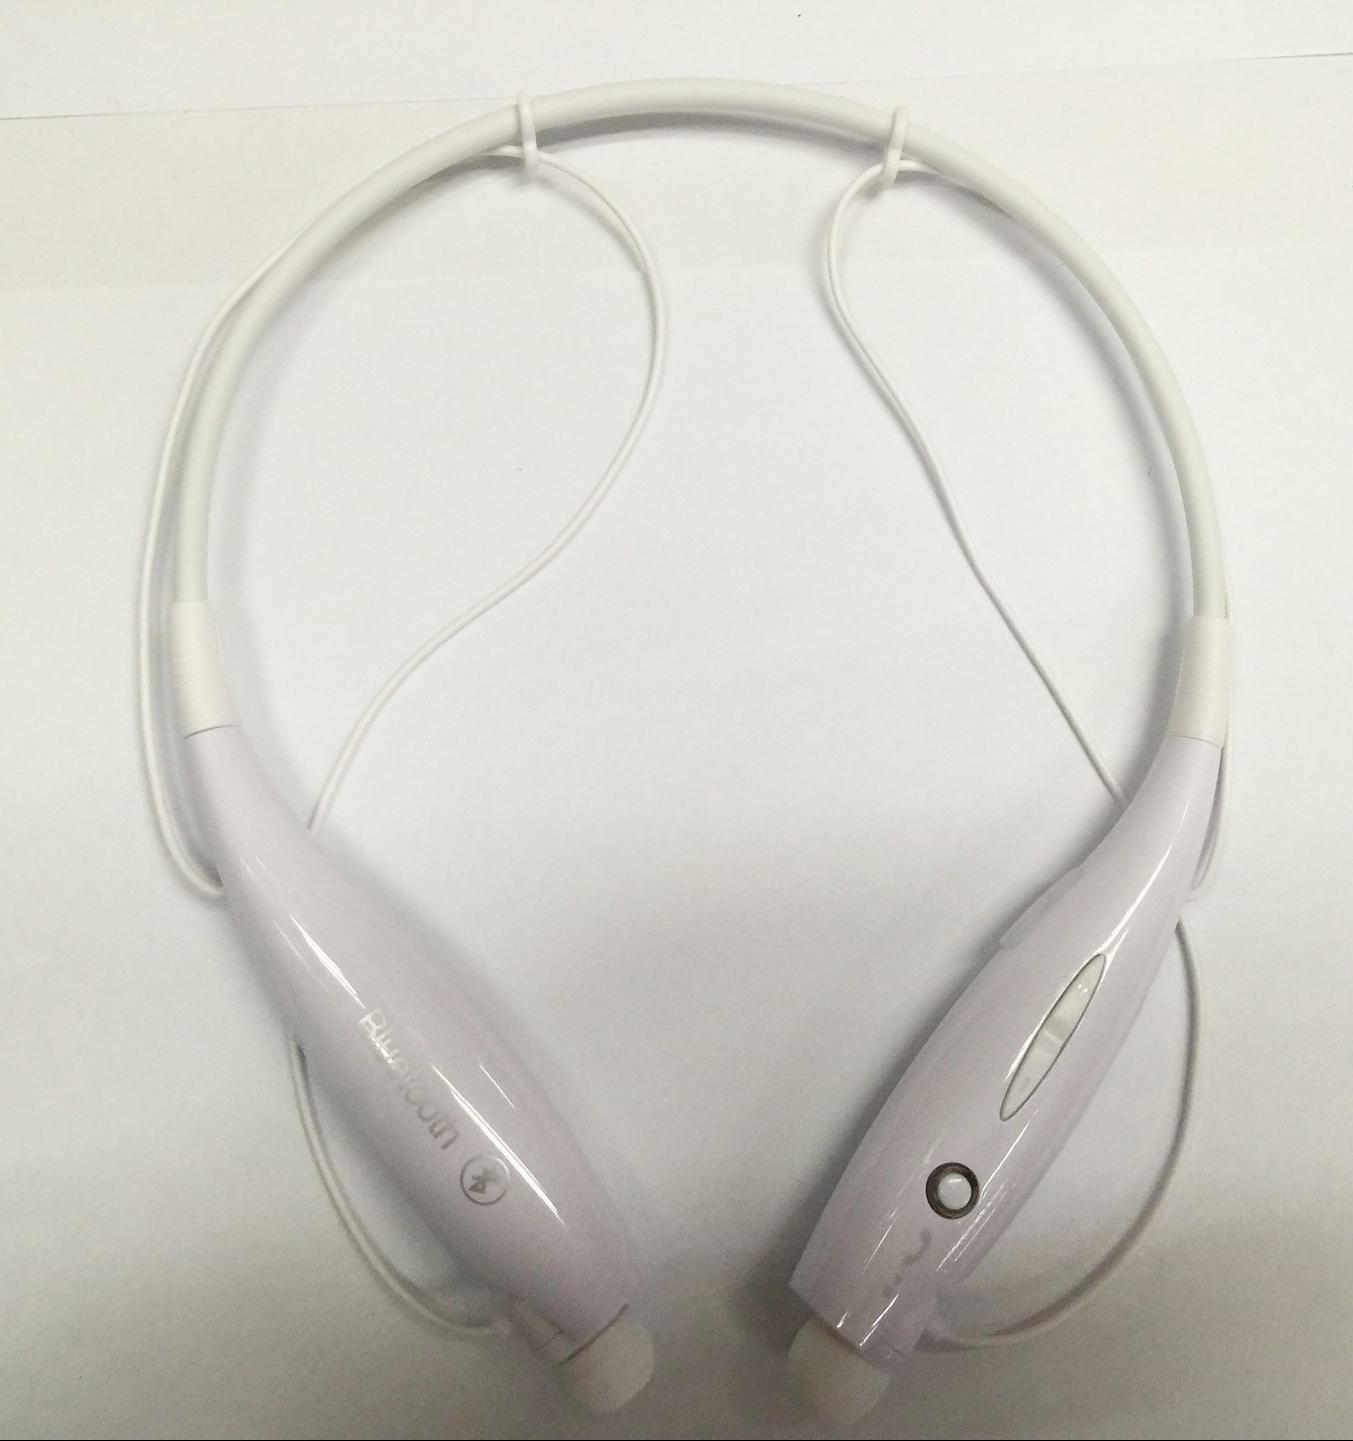 HBS 730 Sport Neckband Headset In-Ear Drahtlose Kopfhörer Bluetooth Stereo Kopfhörer HBS730 Für iPhone Galaxy S6 Edge